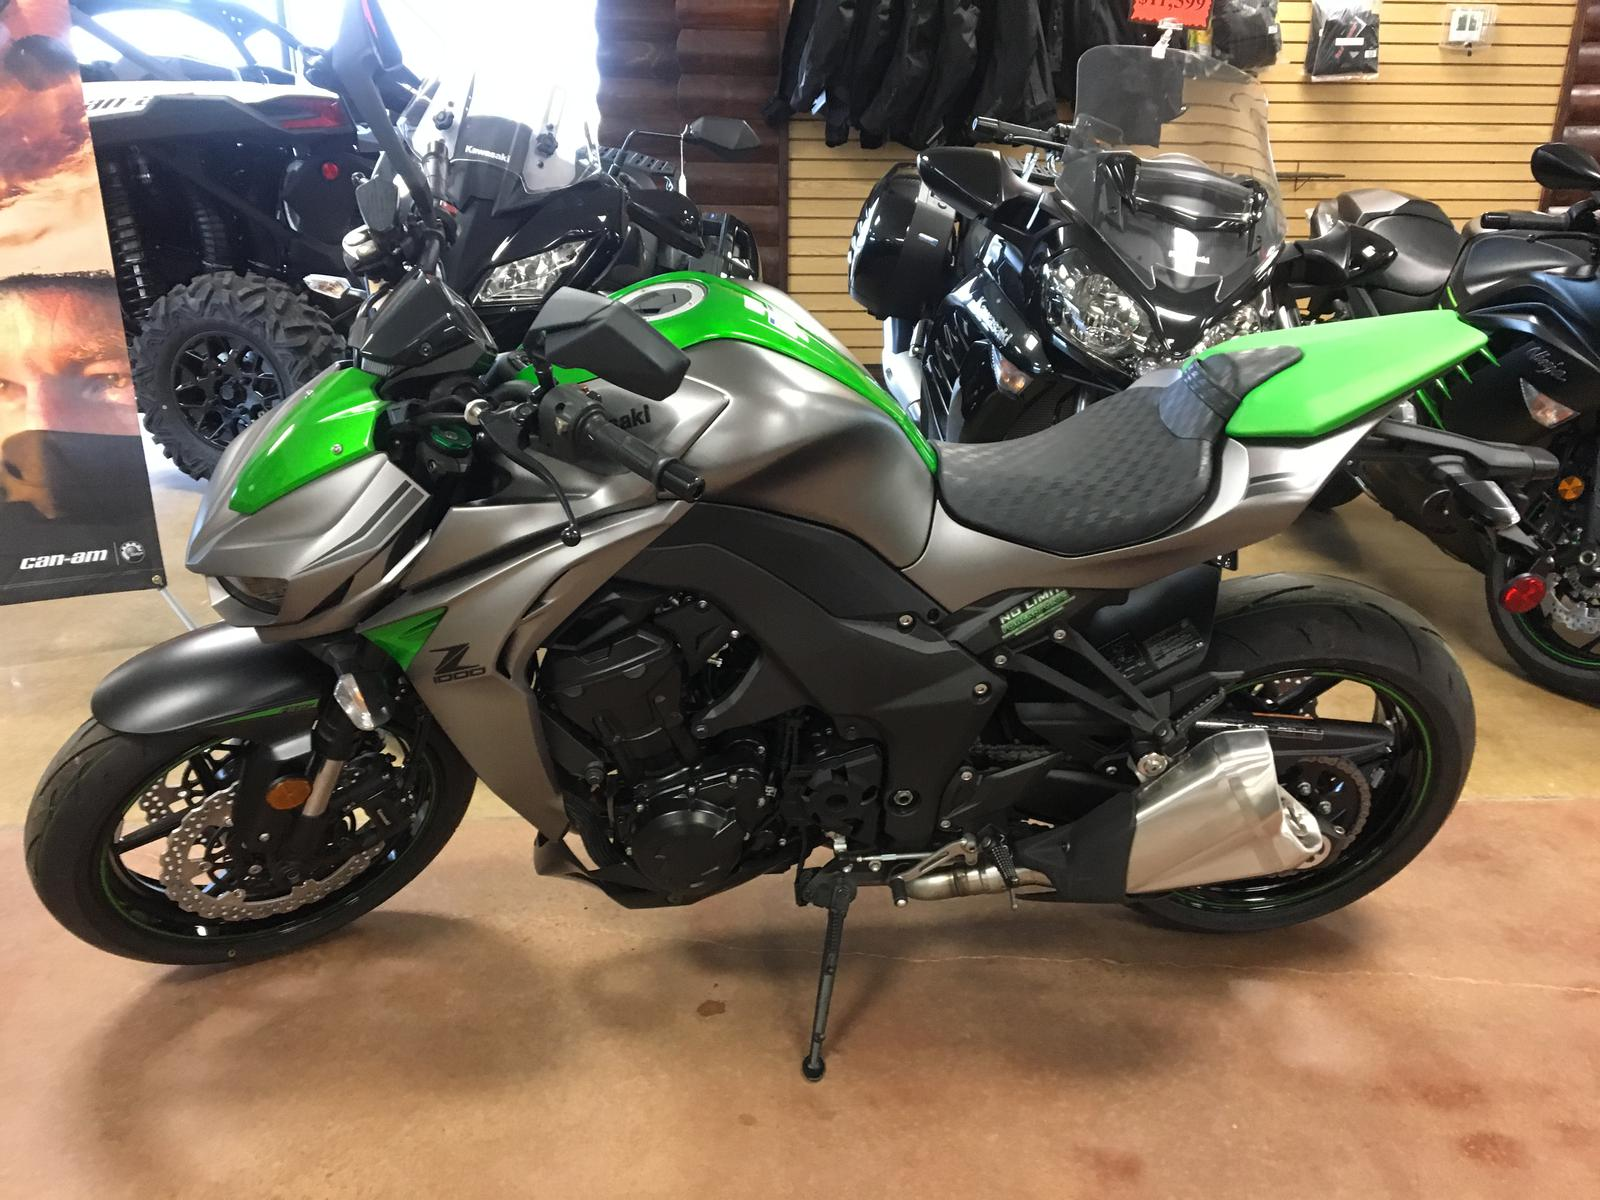 2016 Kawasaki Z1000 ABS For Sale In Bartlesville OK